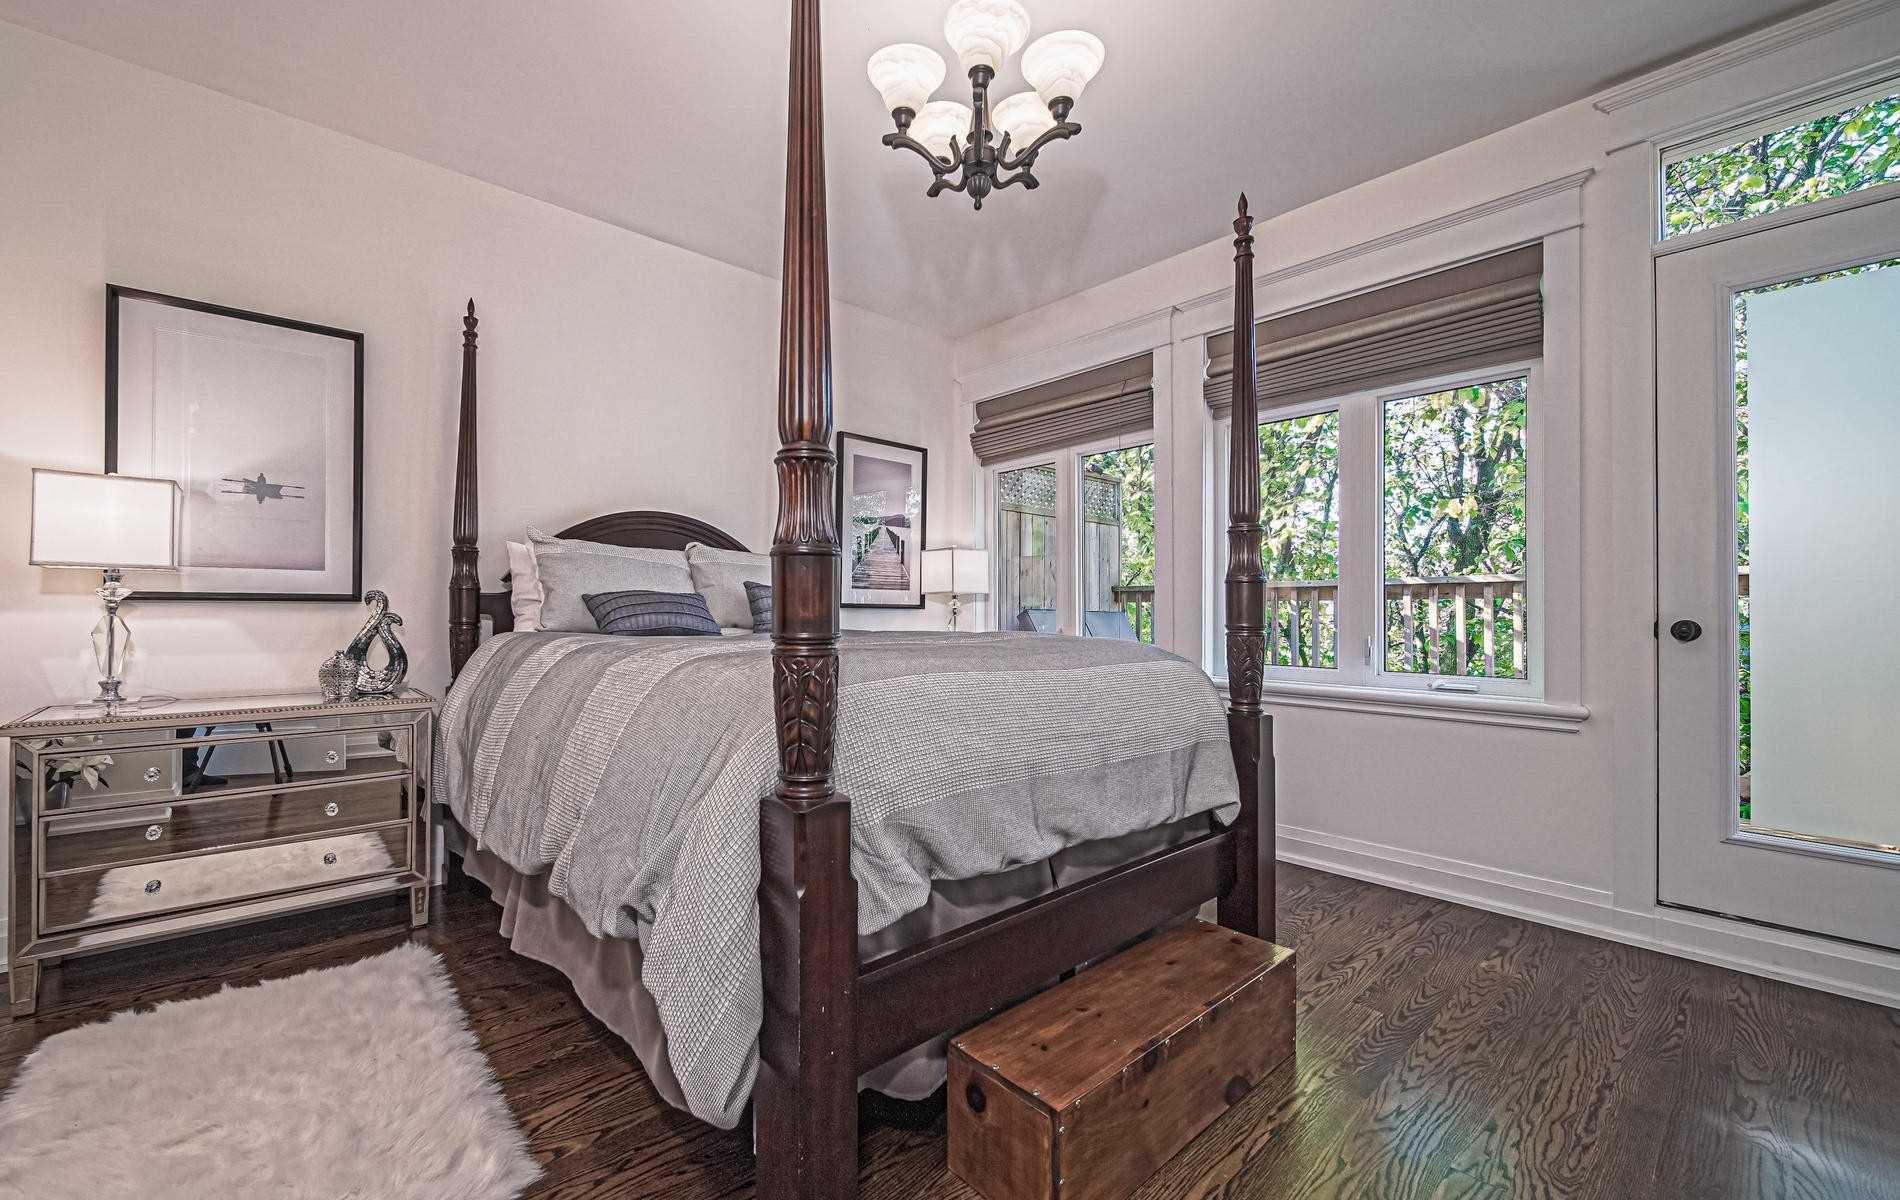 Photo 12: Photos: 216A Hamilton Street in Toronto: South Riverdale House (3-Storey) for sale (Toronto E01)  : MLS®# E4619870